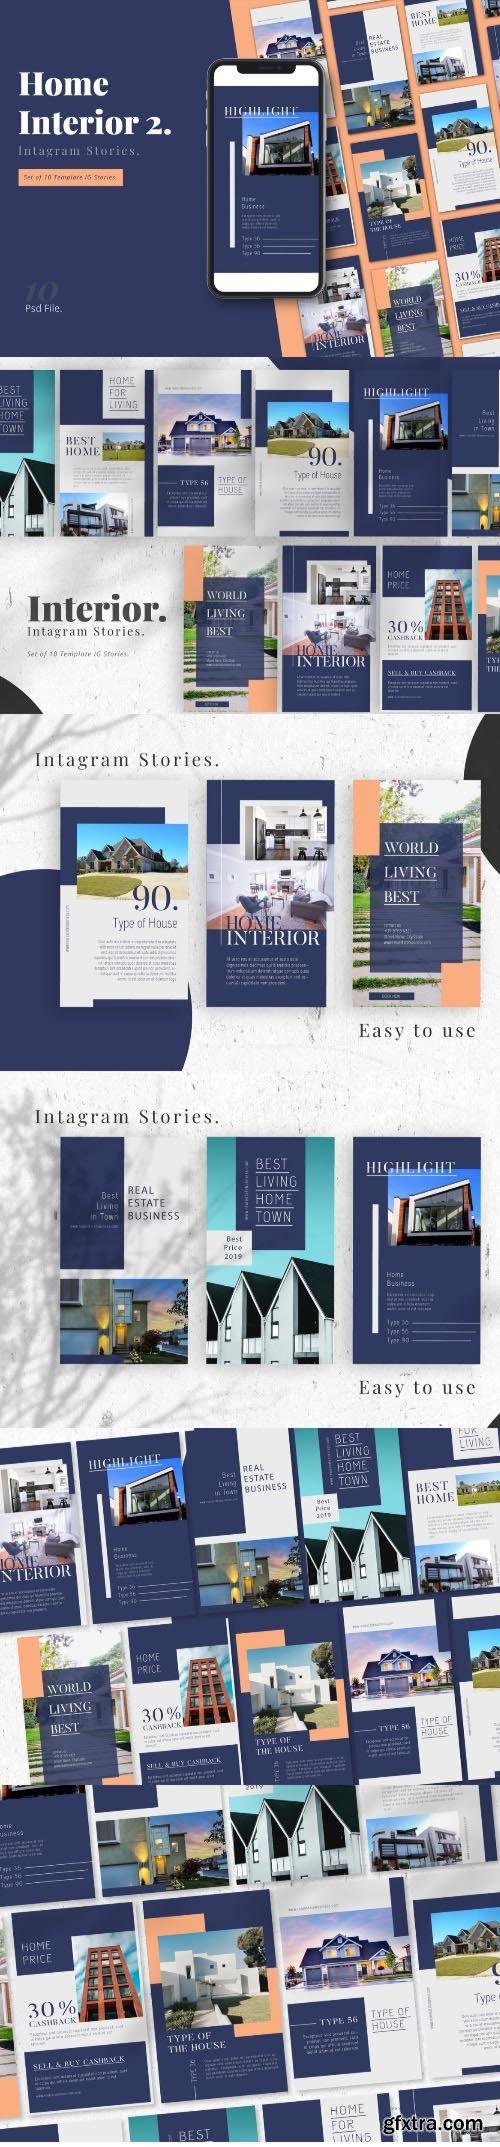 Interior Home Promotion Instagram Stories